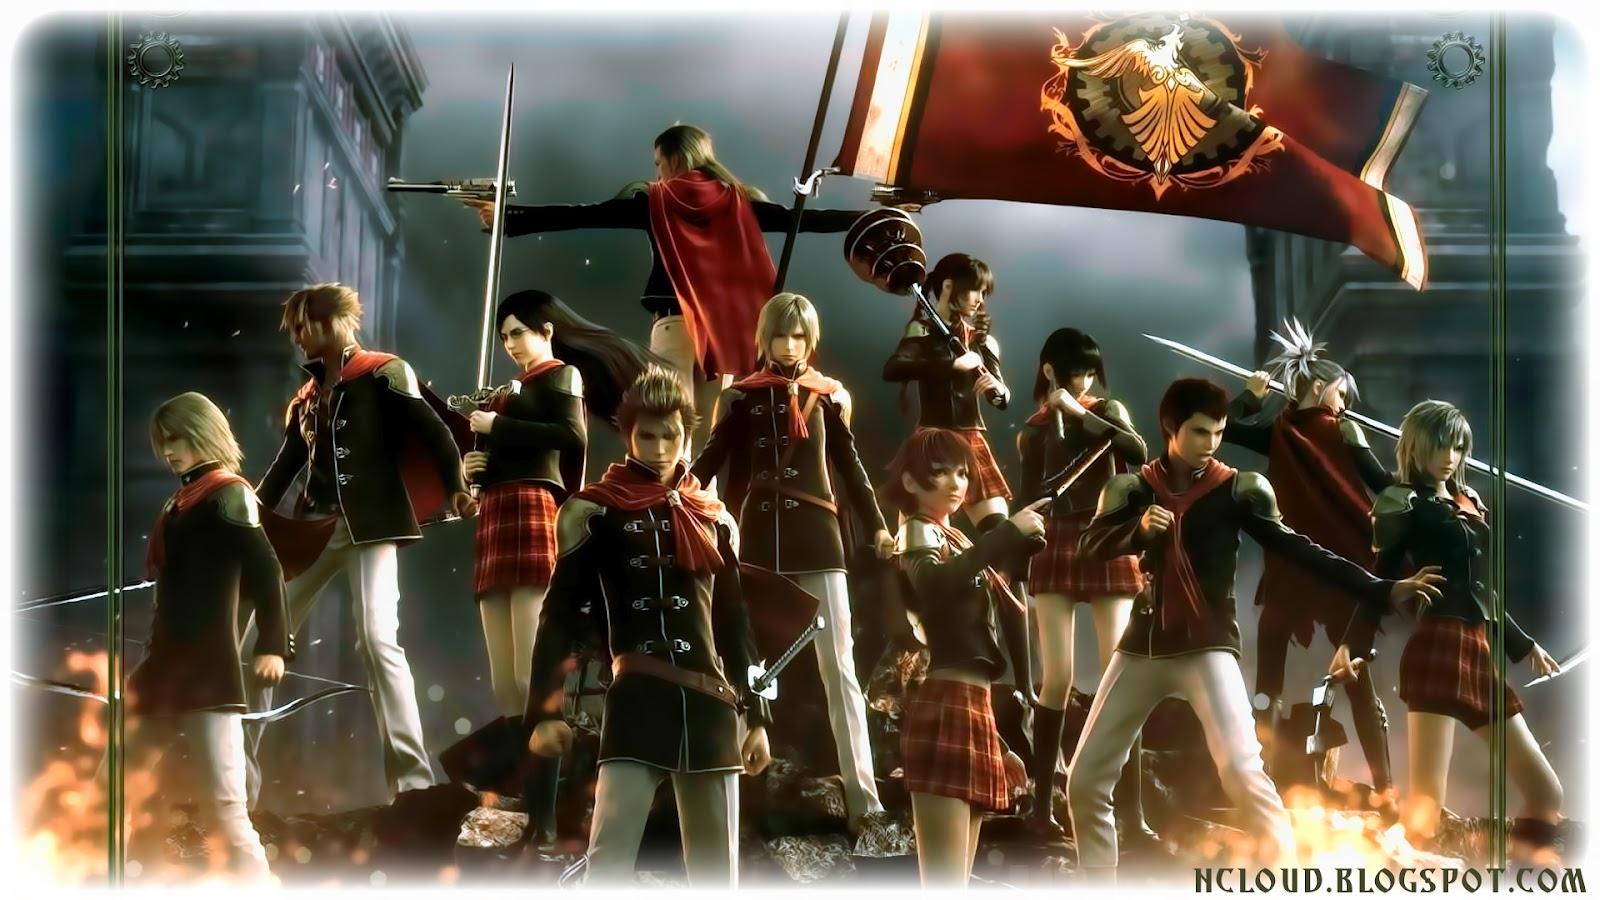 Final Kingdom: Final Fantasy Type-0 Wallpapers